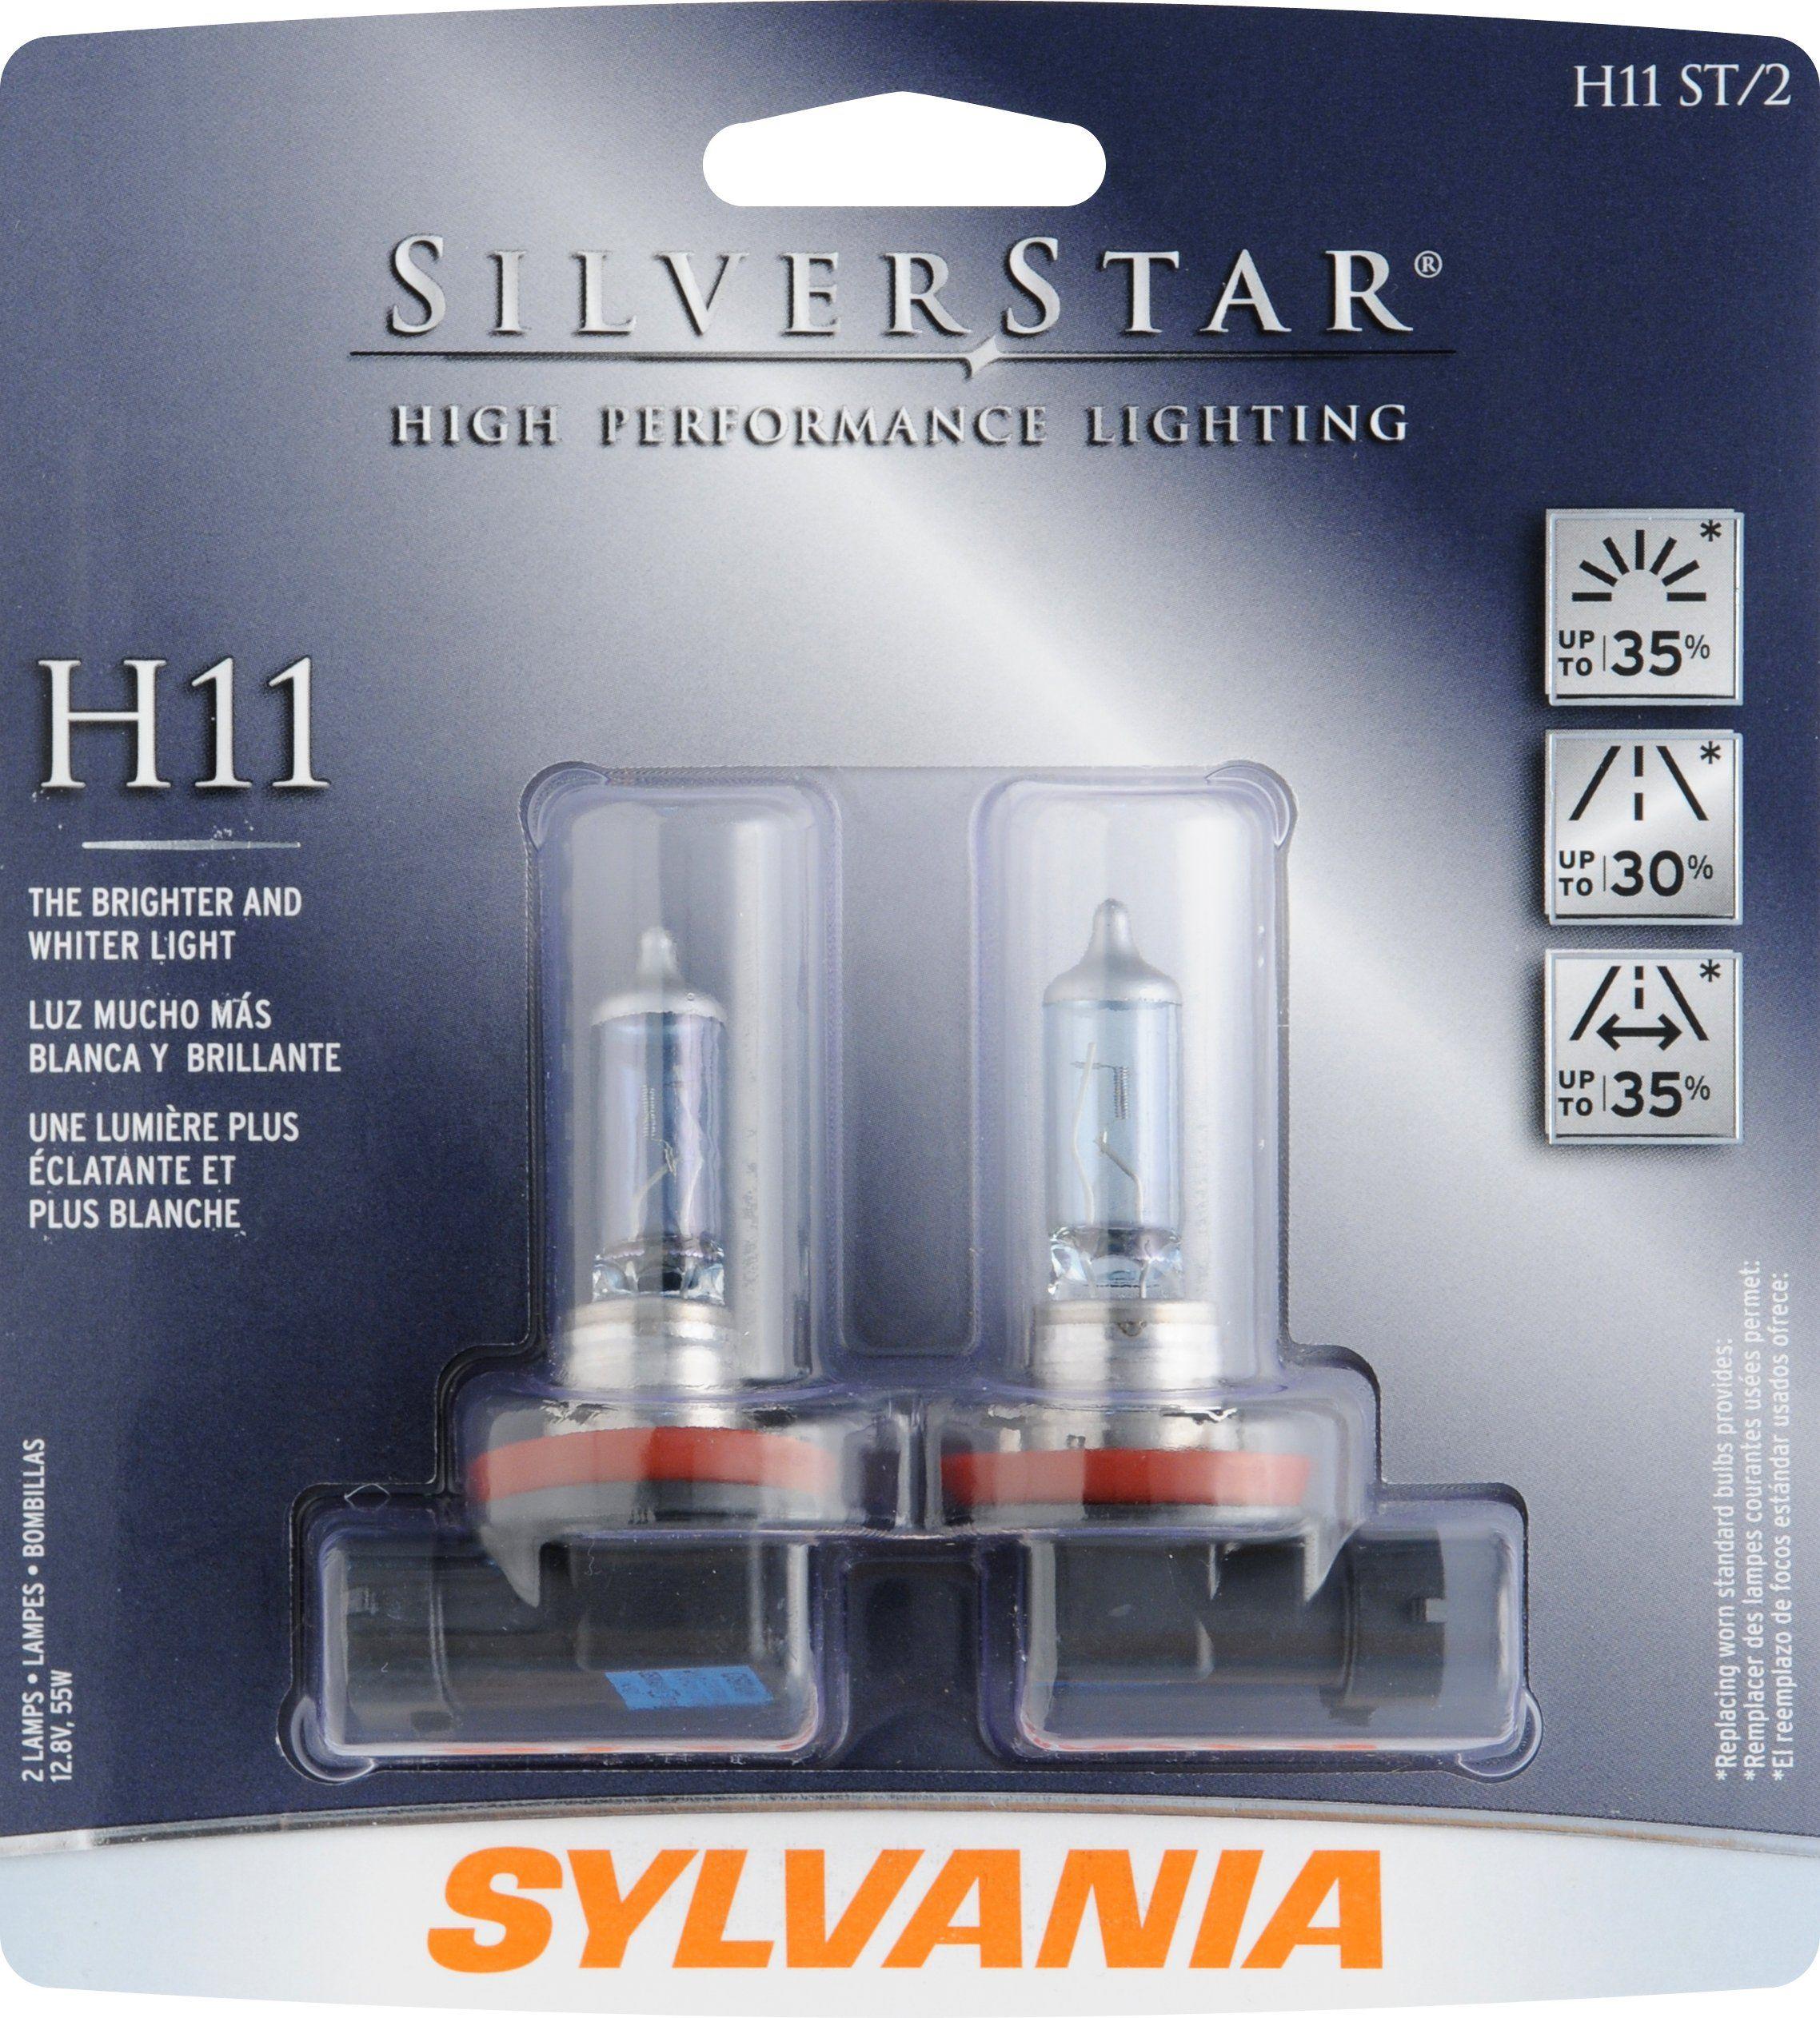 Sylvania H11 St Silverstar High Performance Halogen